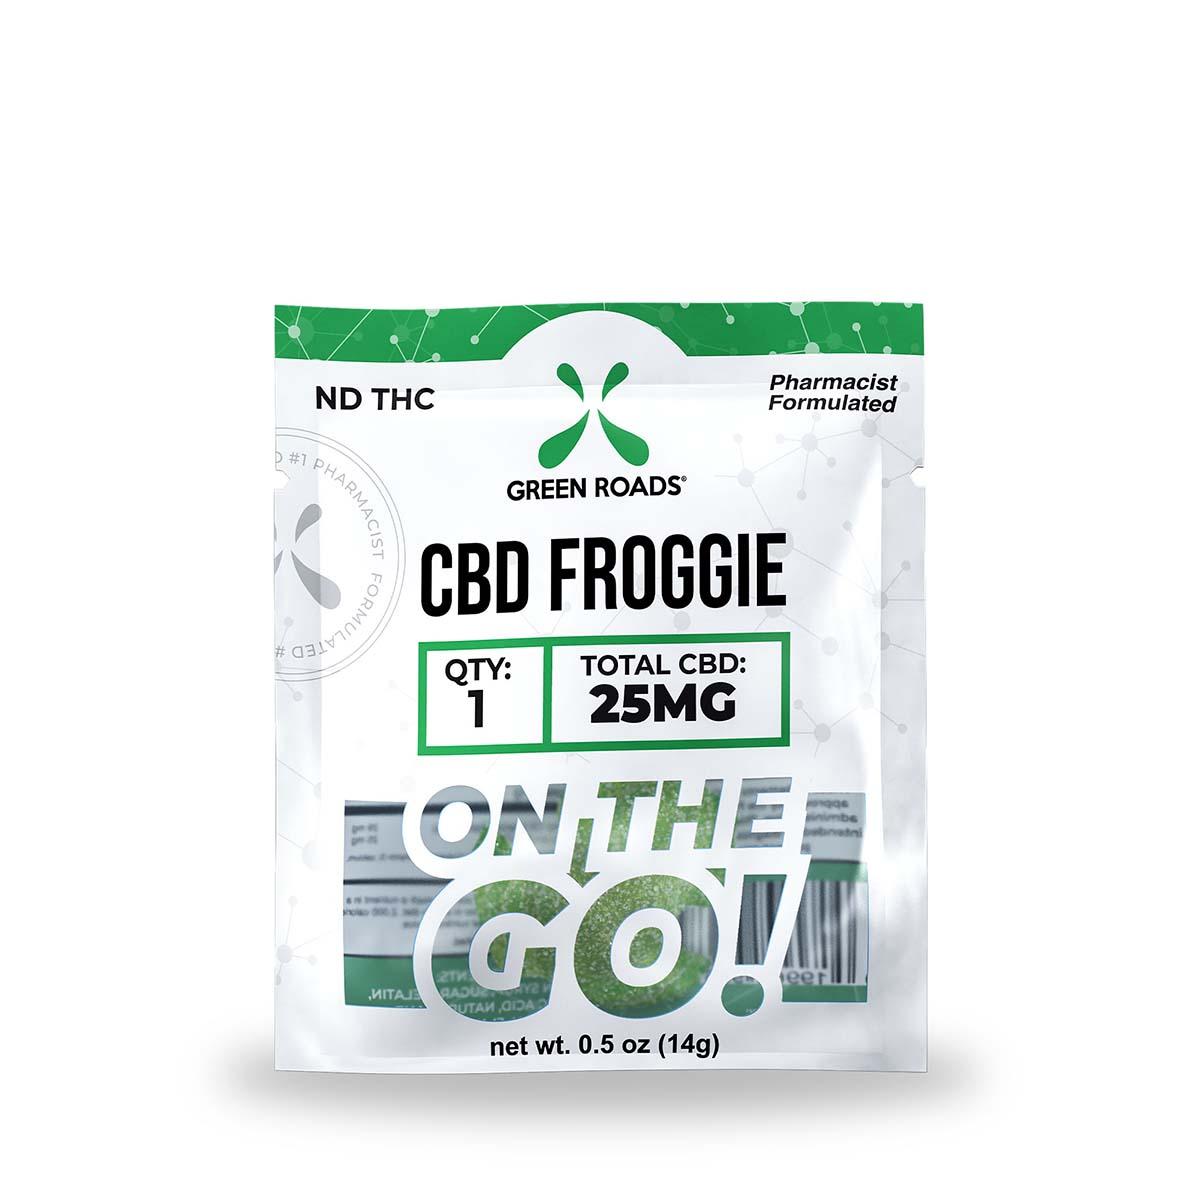 25mg Froggie - OTG